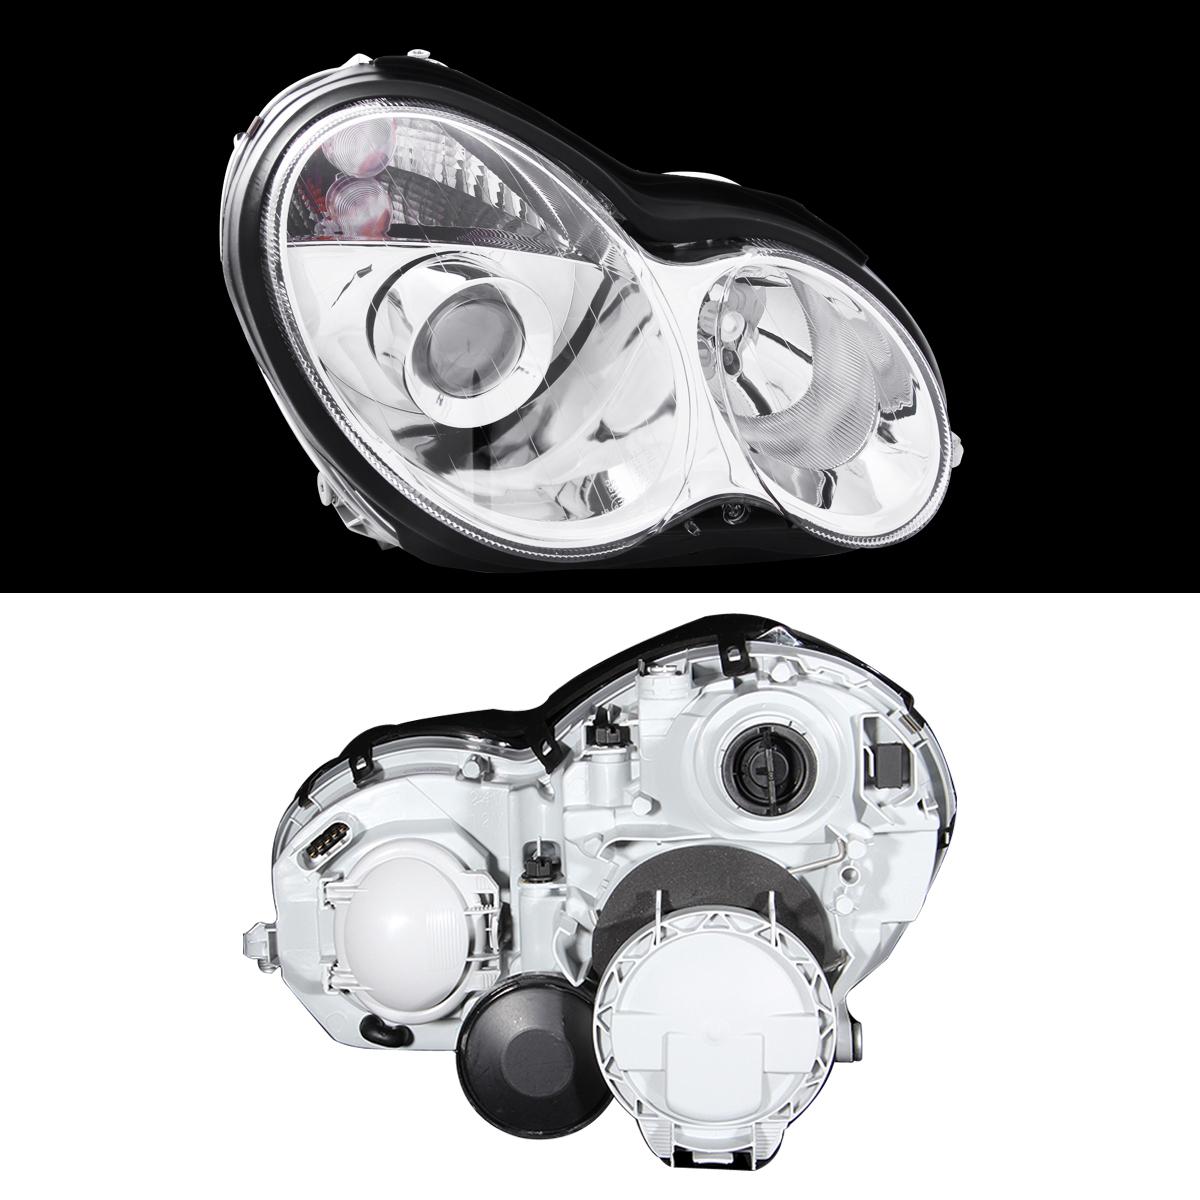 2001 2002 2003 2004 2005 2006 2007 mercedes w203 c230 c240 c320 headlights